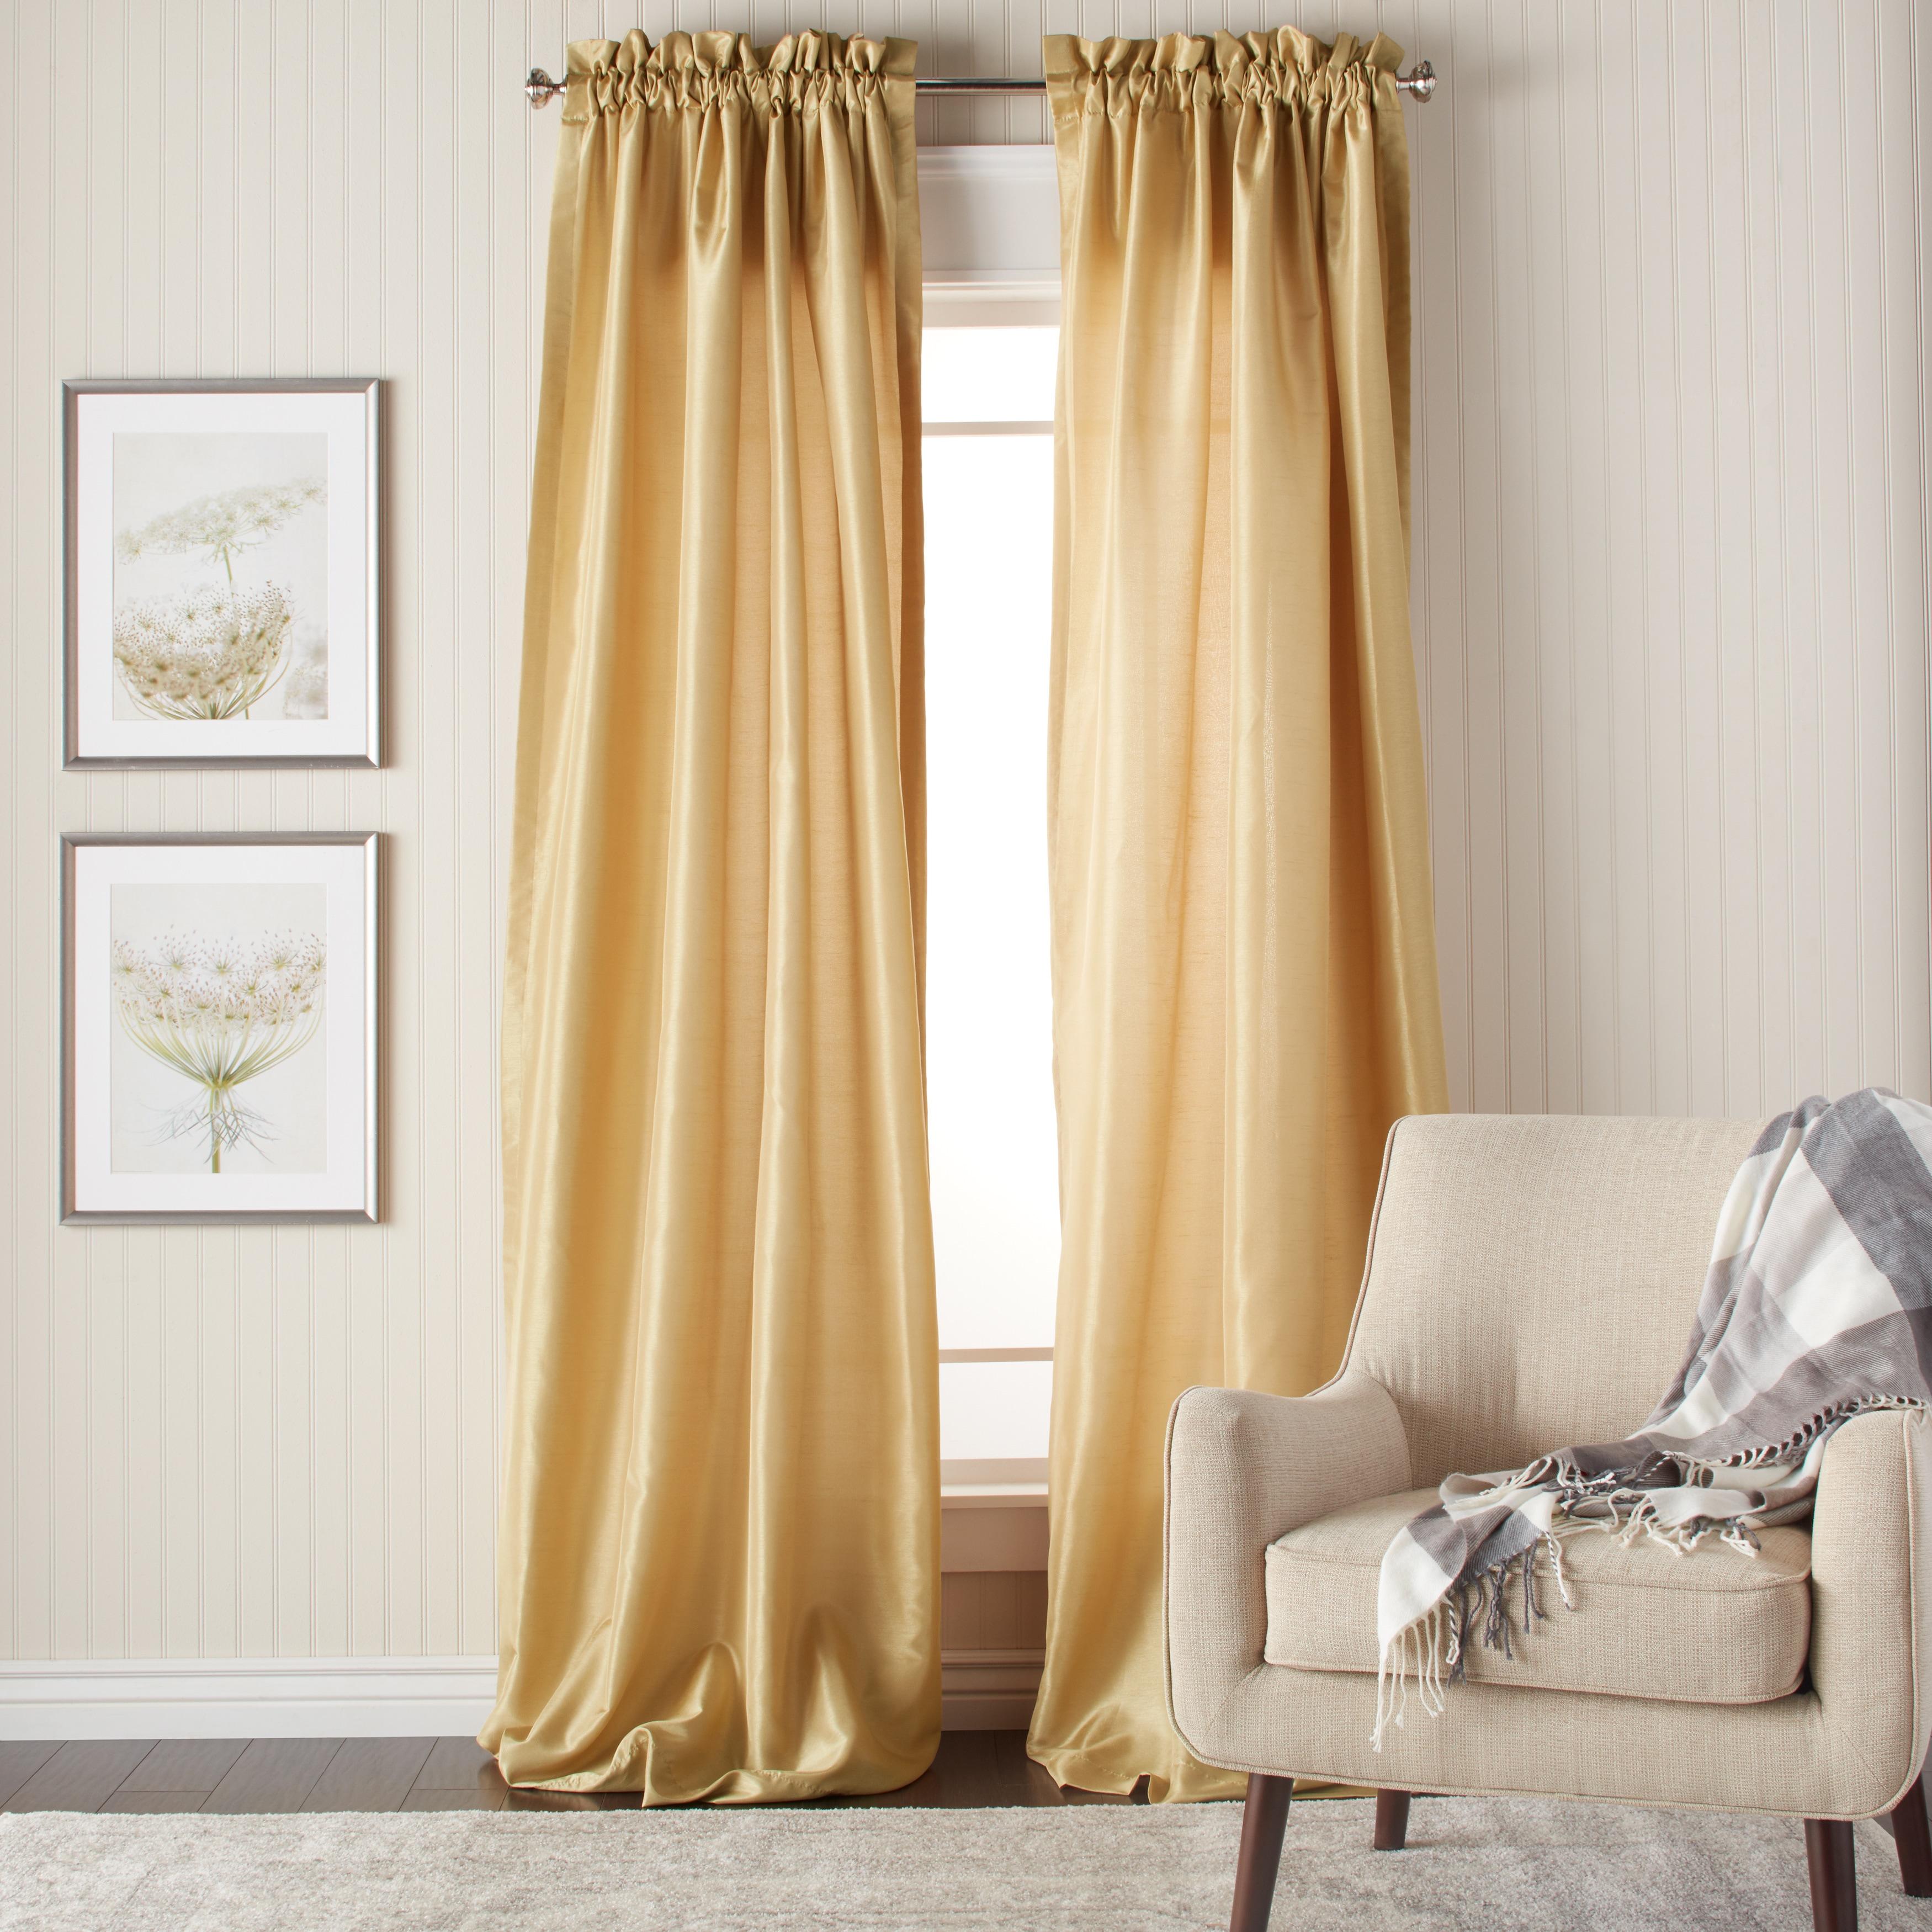 blackout eclipse darkening tension com curtain inch walmart curtains rod ip room